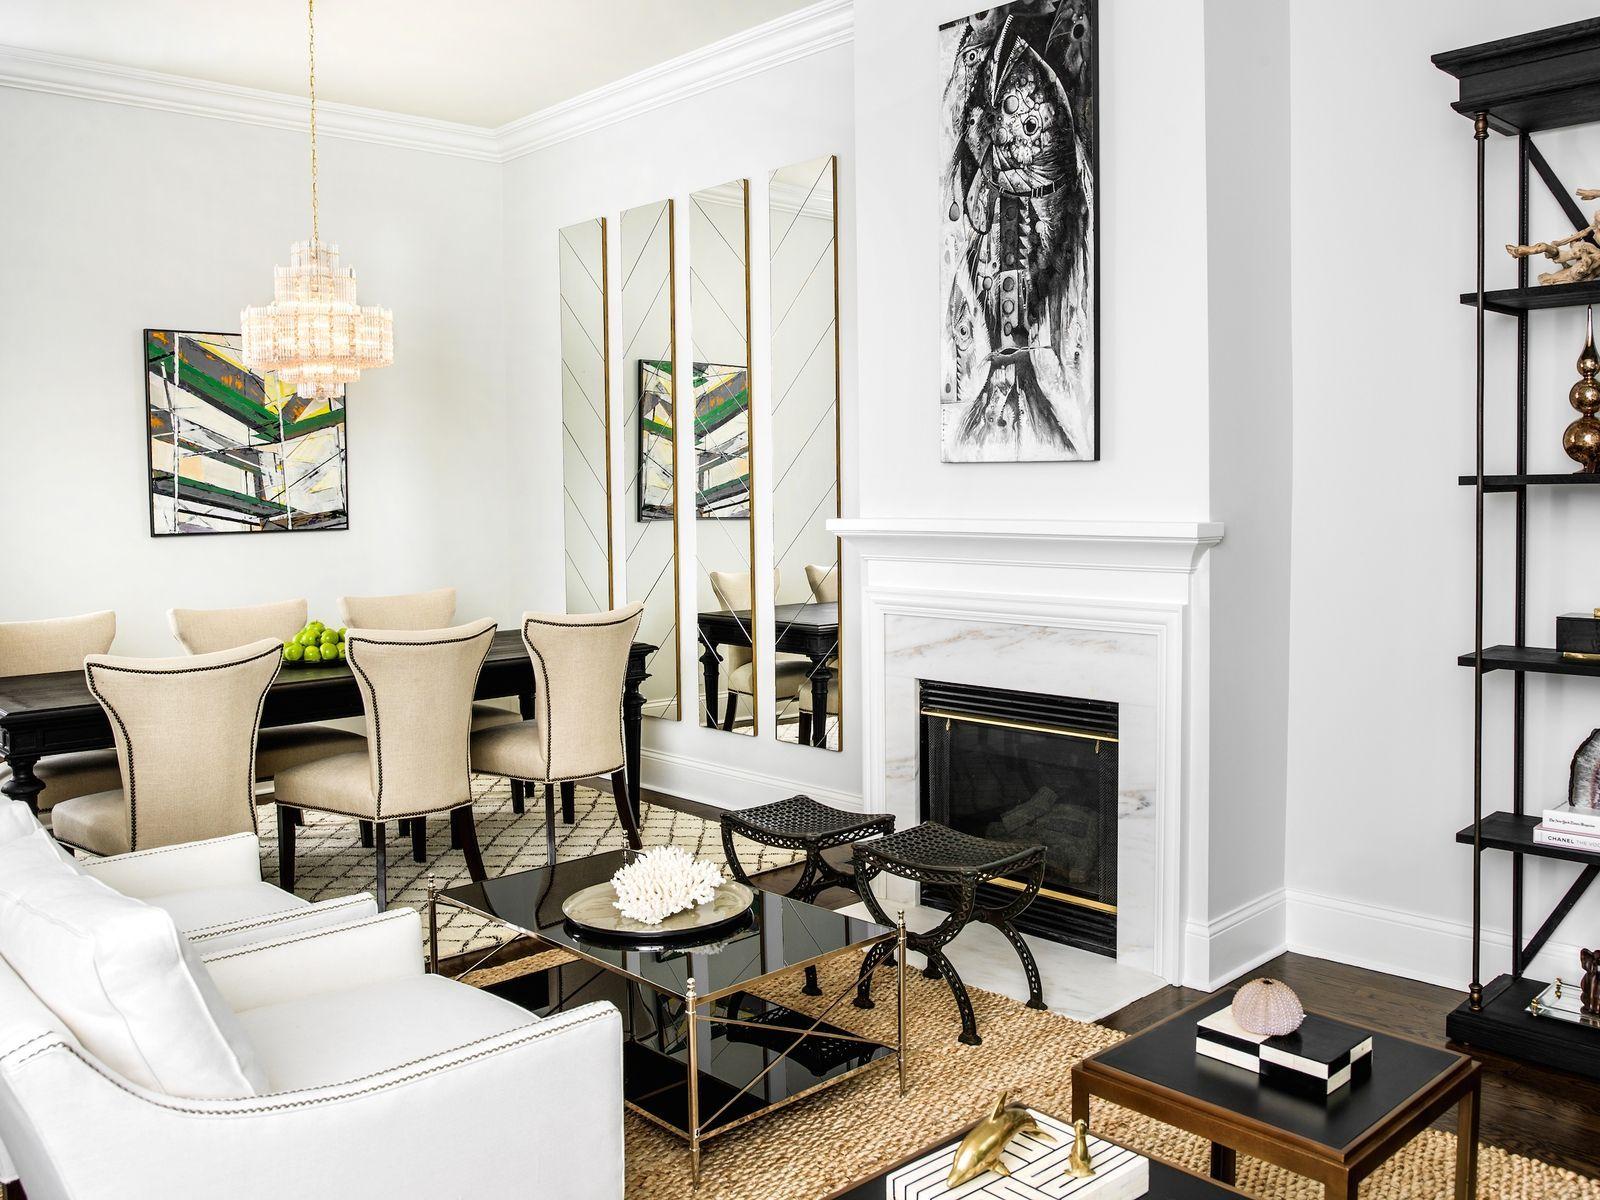 best open floor plans for life without walls dining open floor